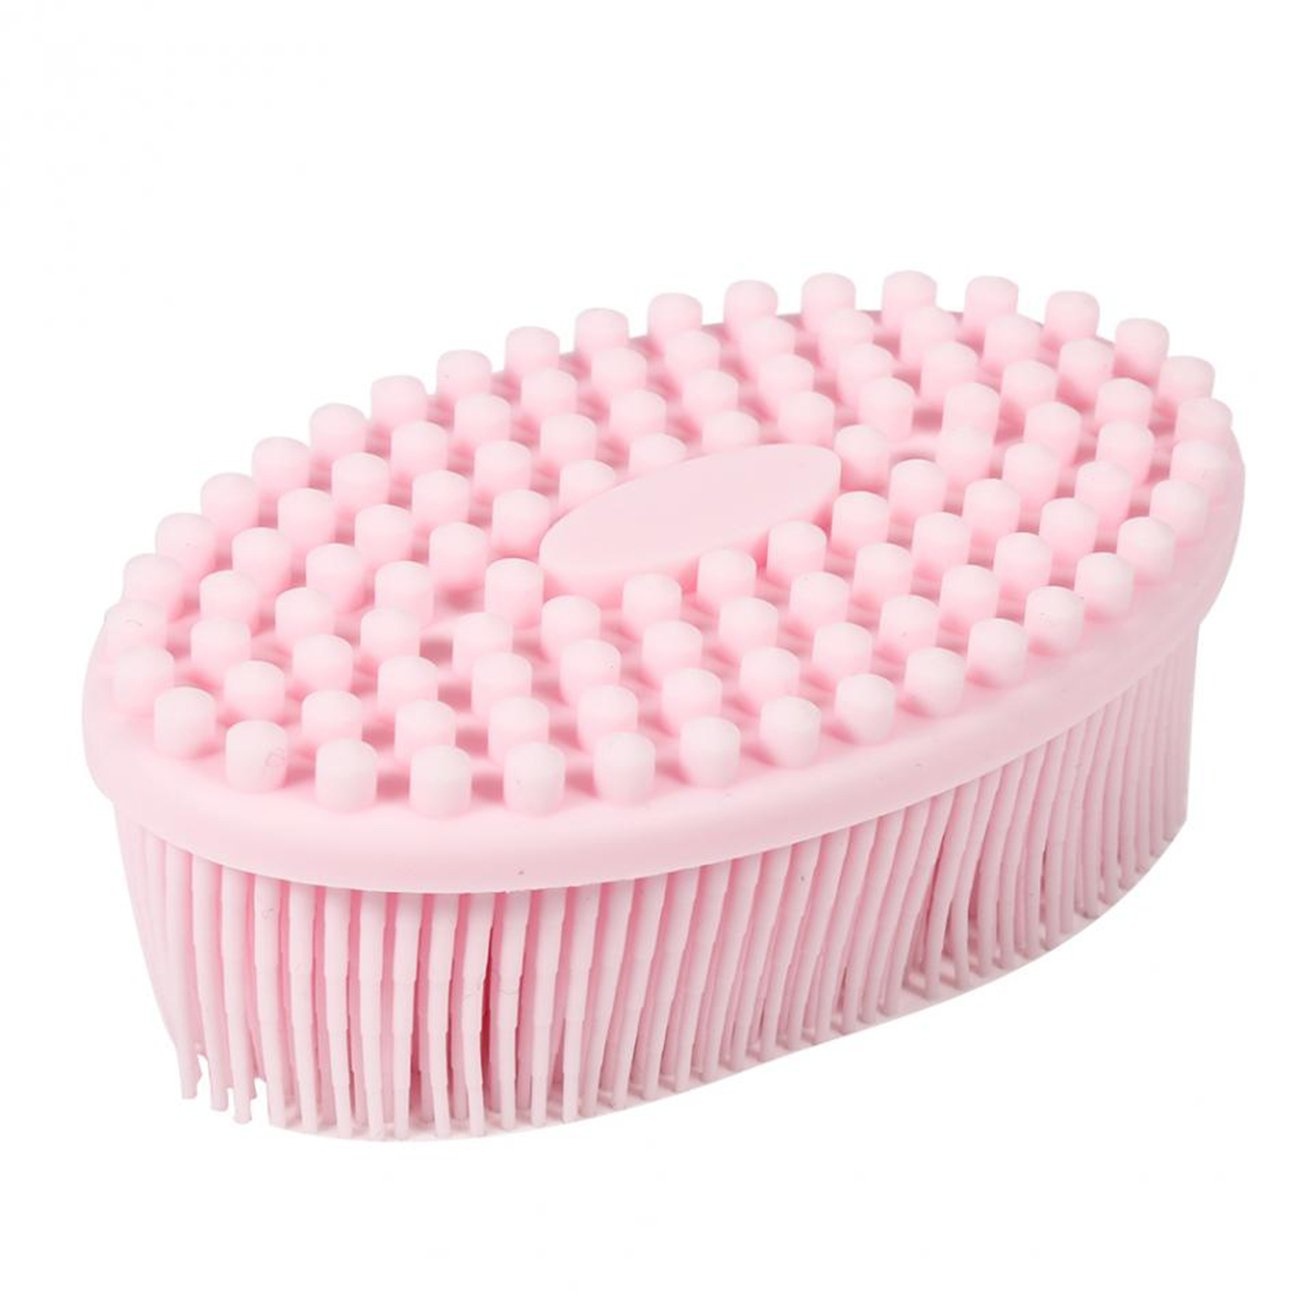 100% Silicone Bath & Shower Loofah Brush For Face & Body Gentel Scrub Skin Exfoliation-Skin Health Beauty Care-Cellulite Treatment--Massaging Brush Long Bristle GoWorth